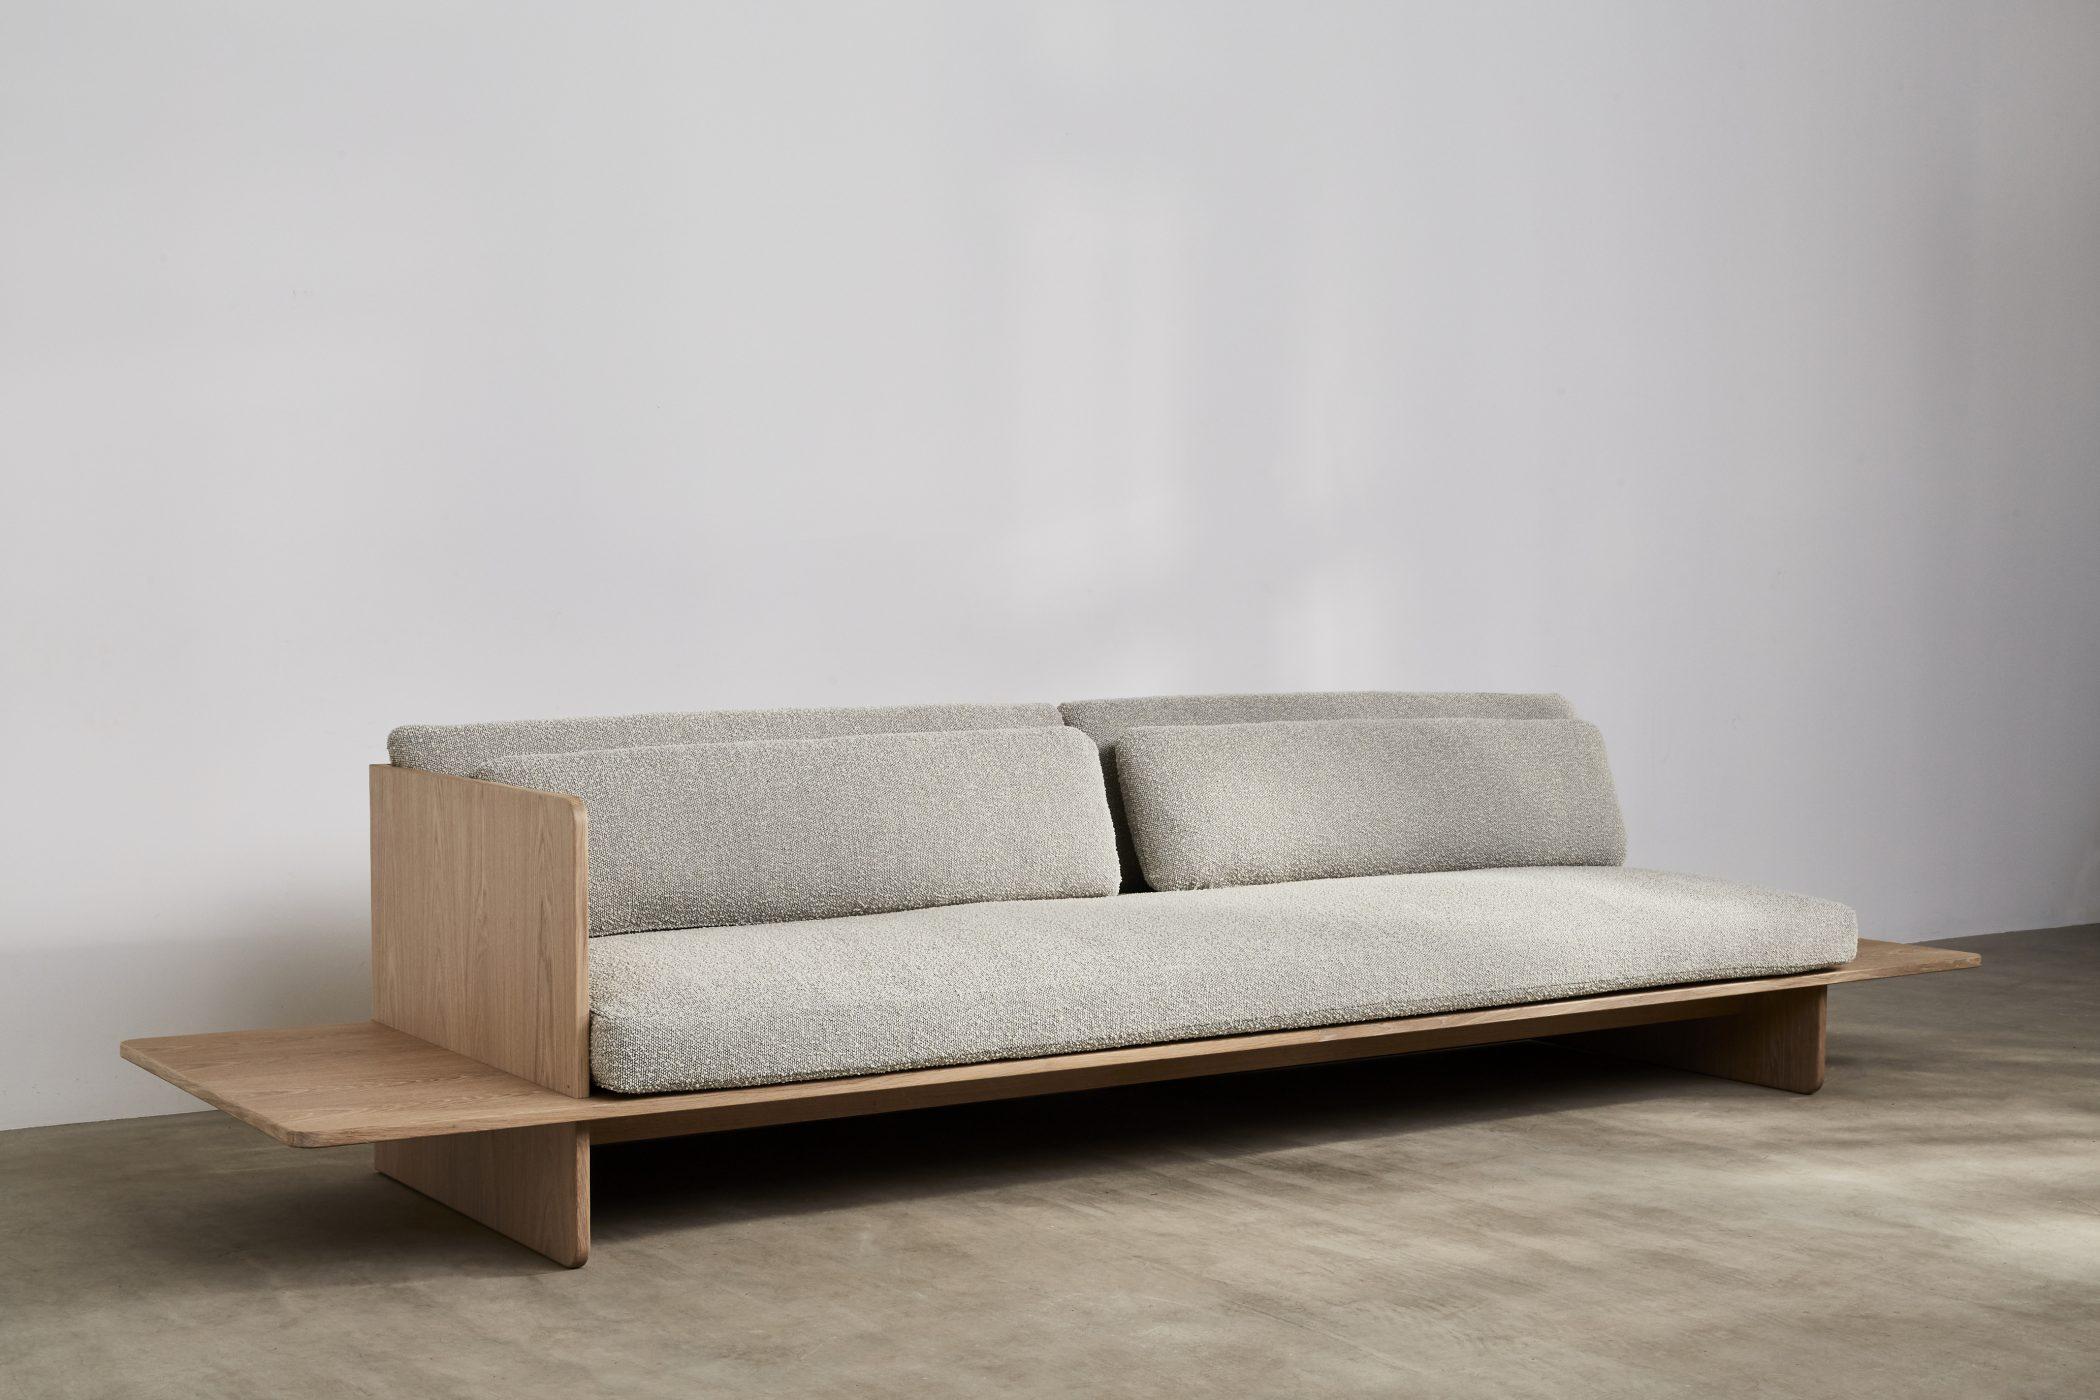 The sofa of my dreams.